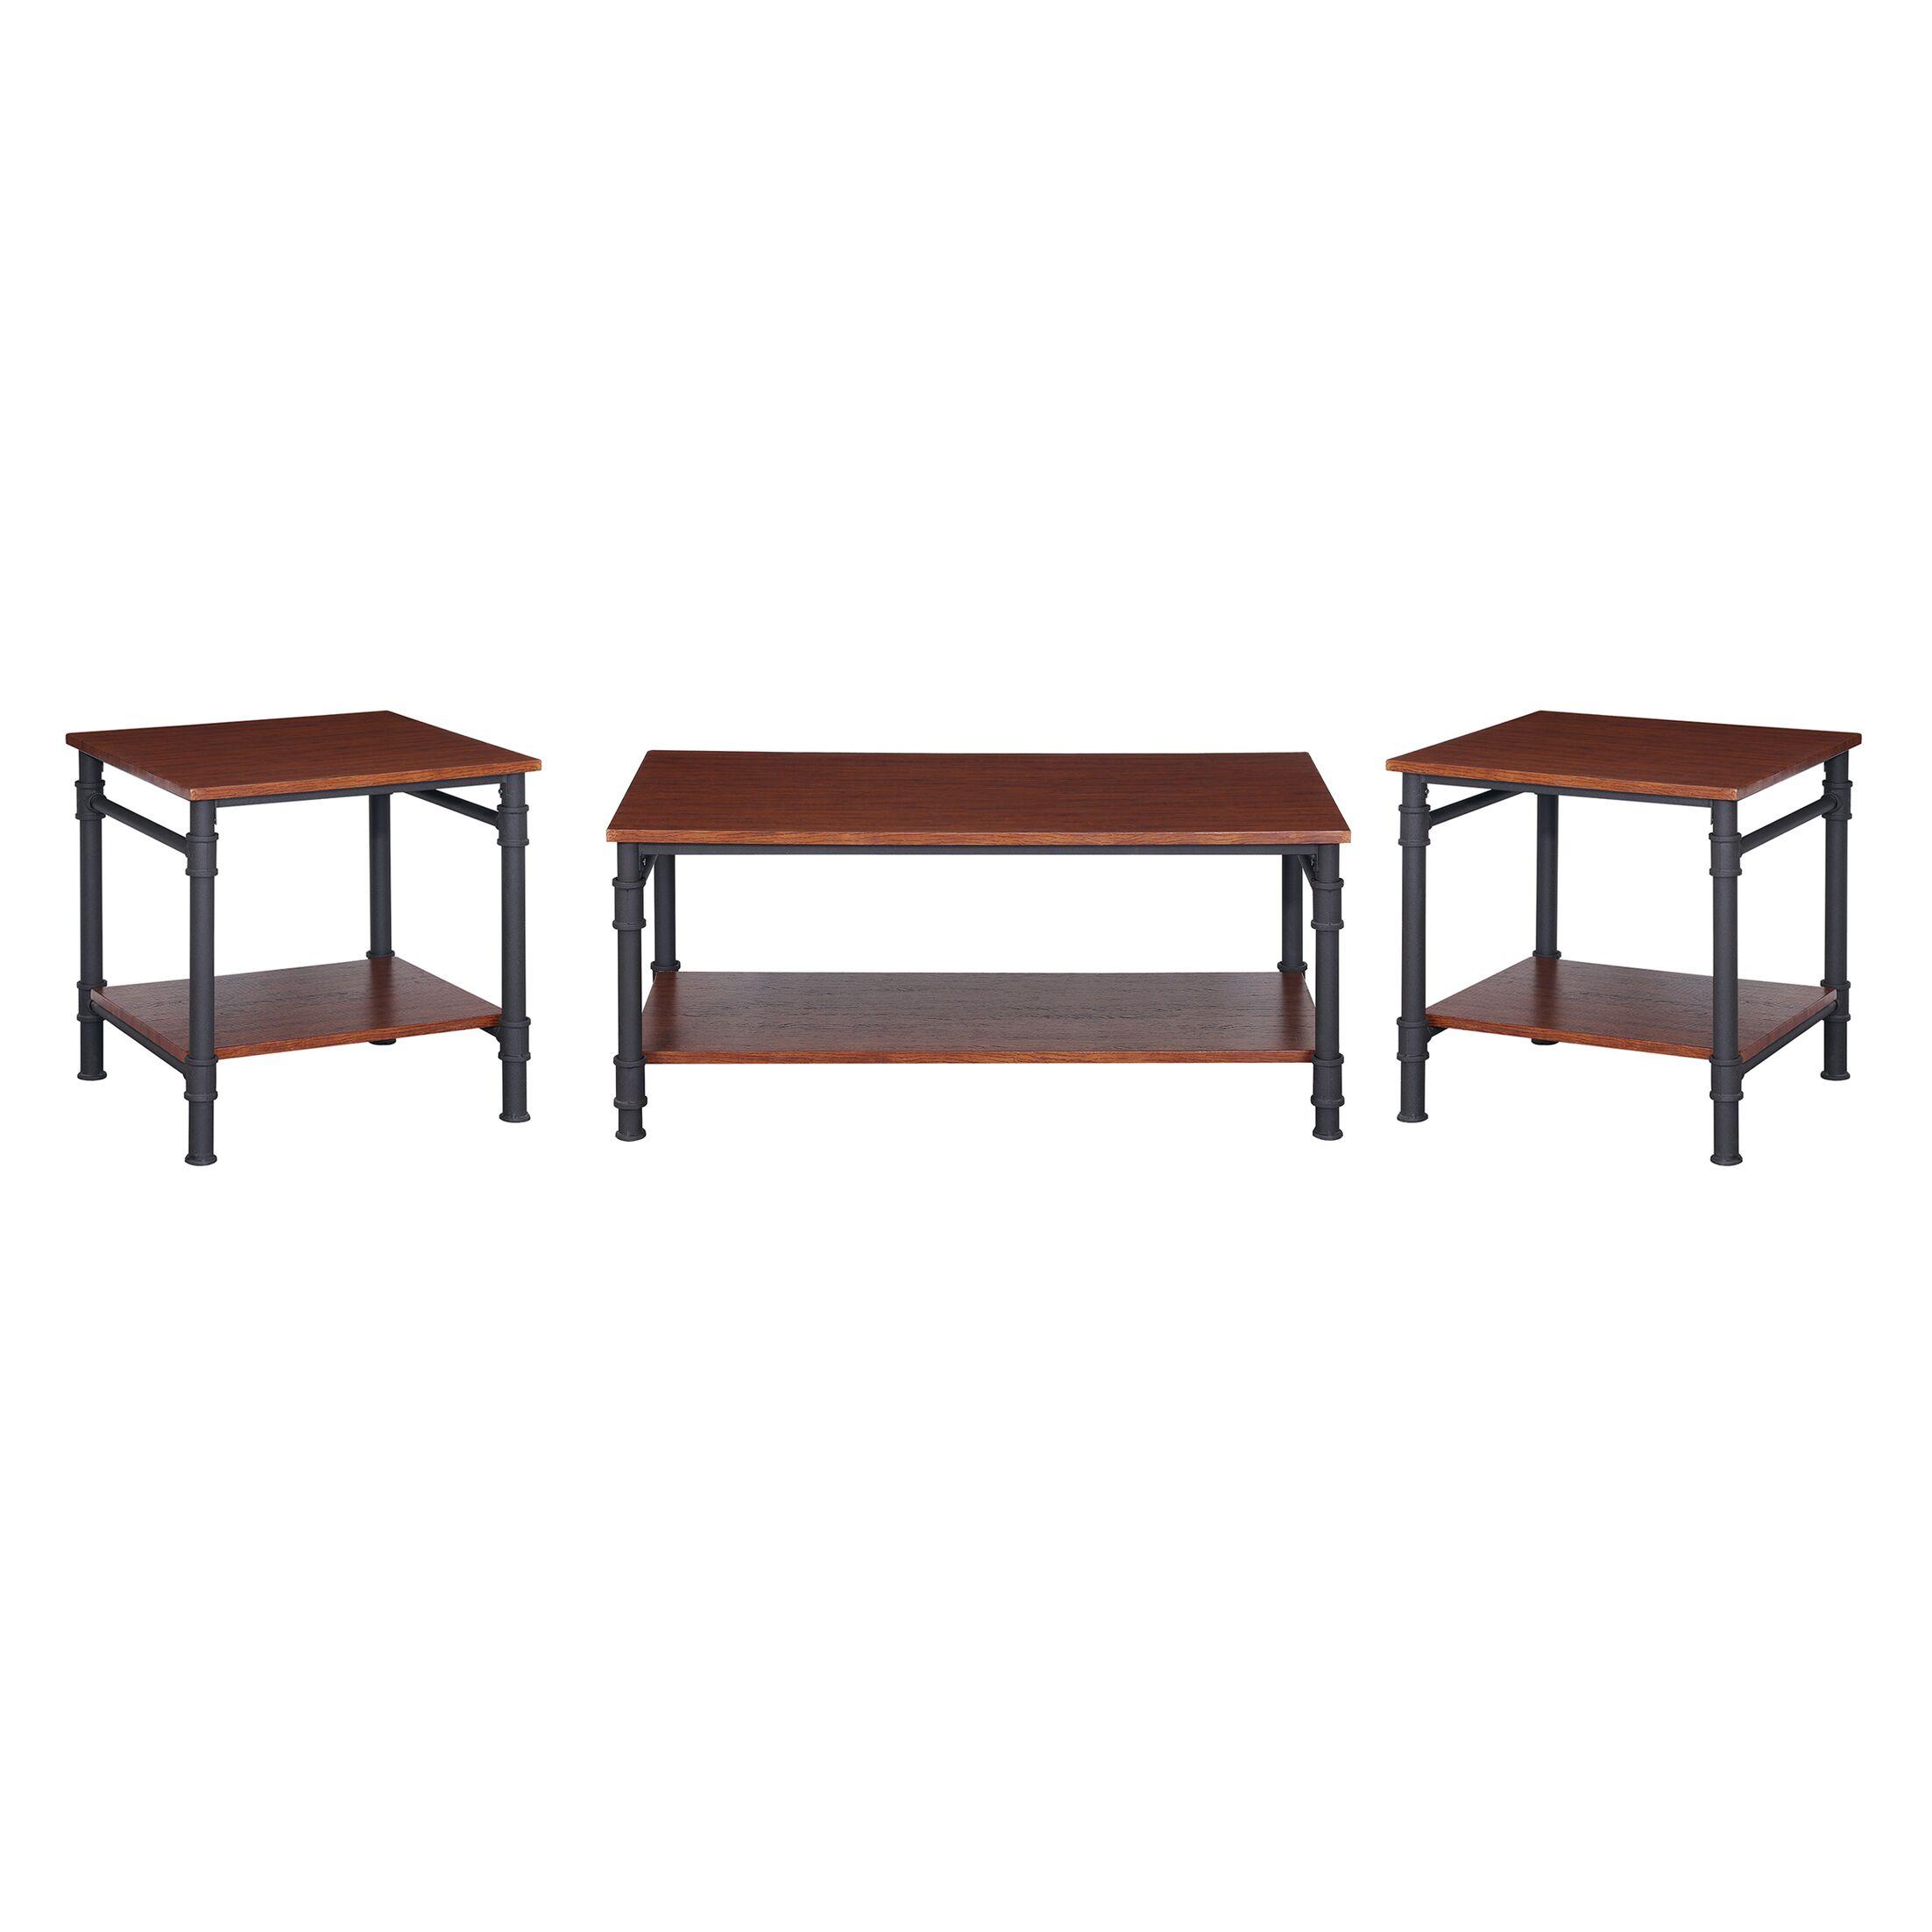 Bealeton Faux Wood 3 Piece Coffee Table Set